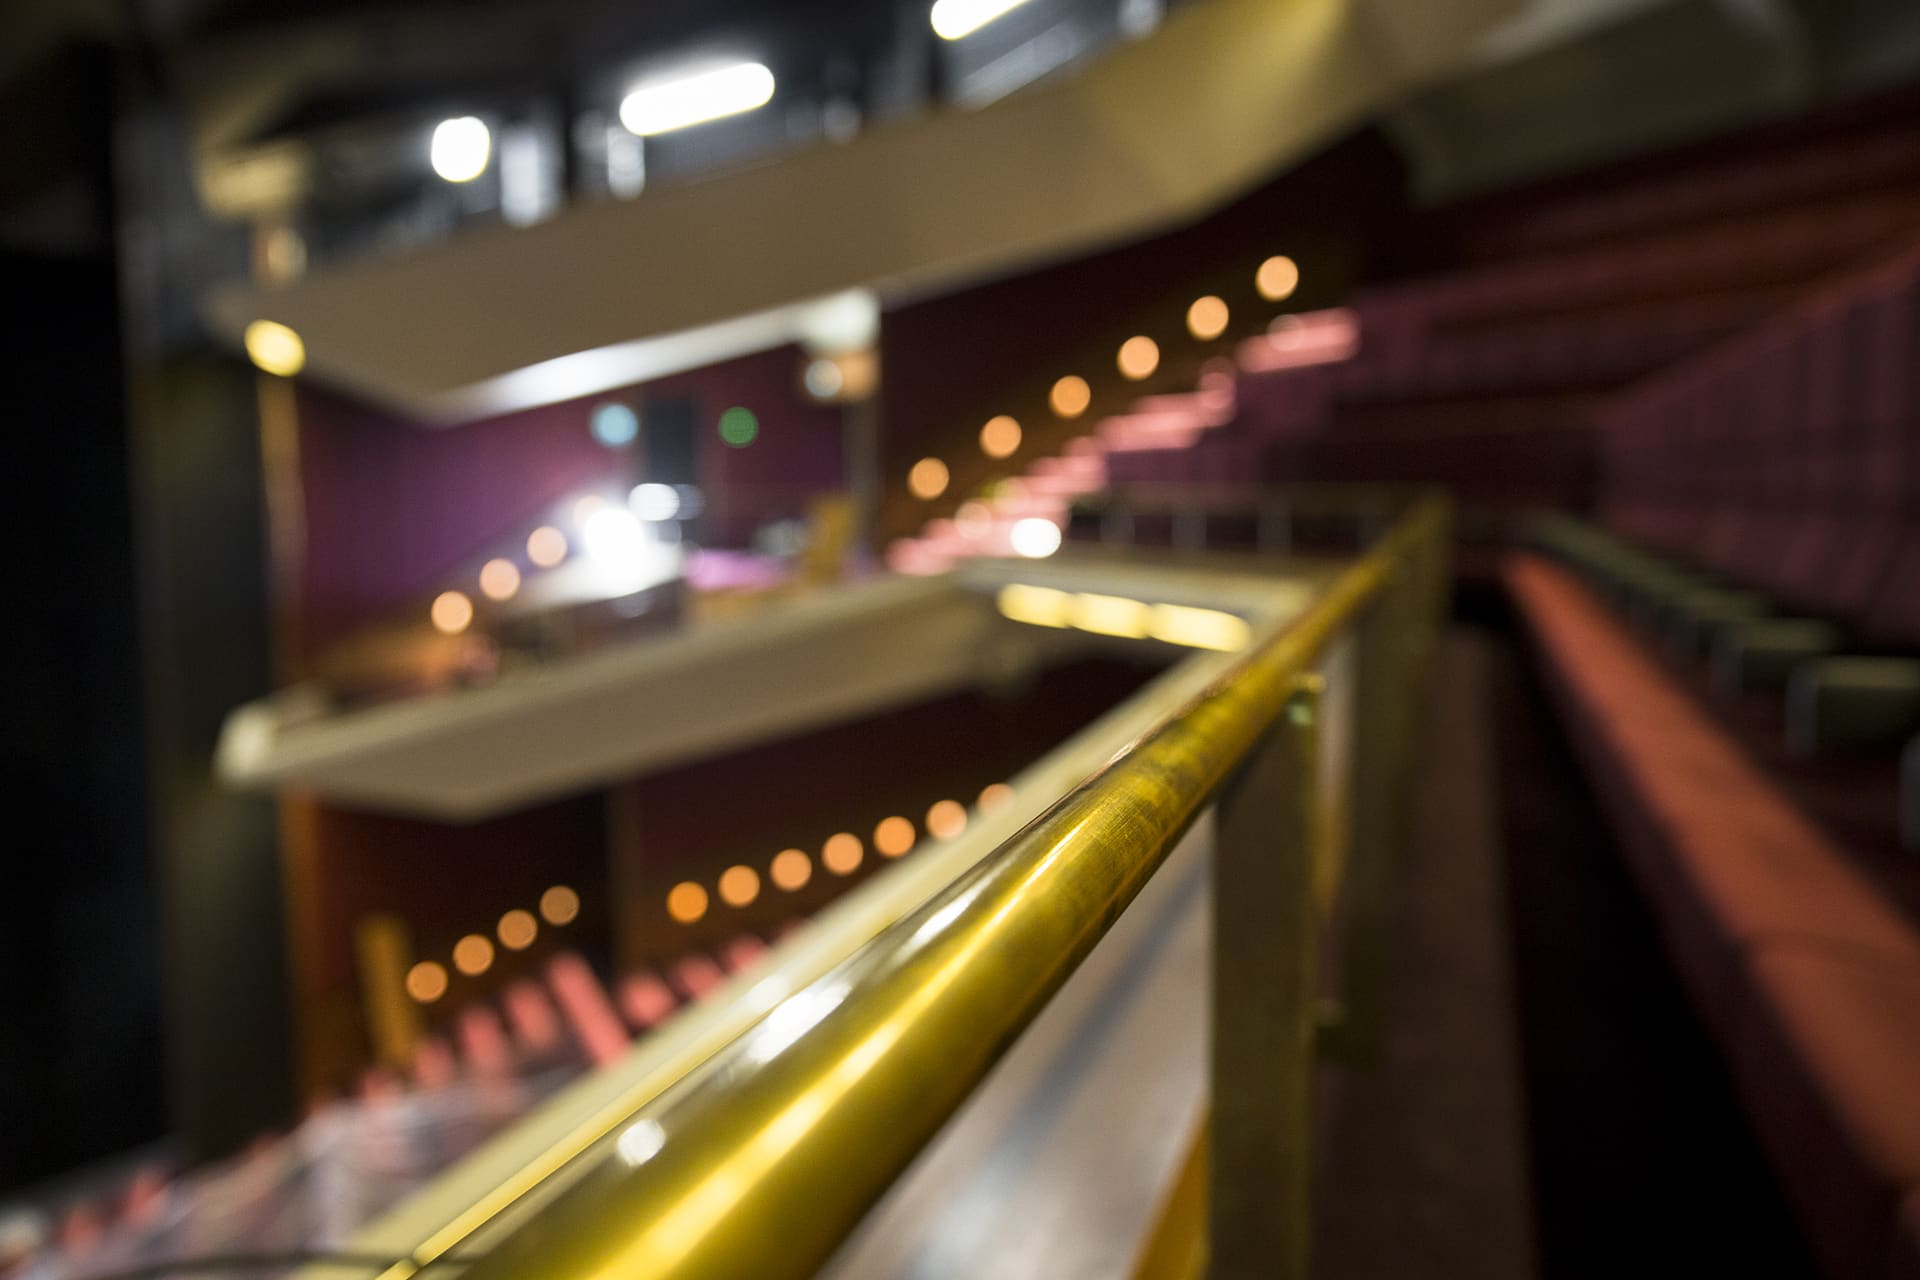 Helsingin Kaupunginteatterin katsomo